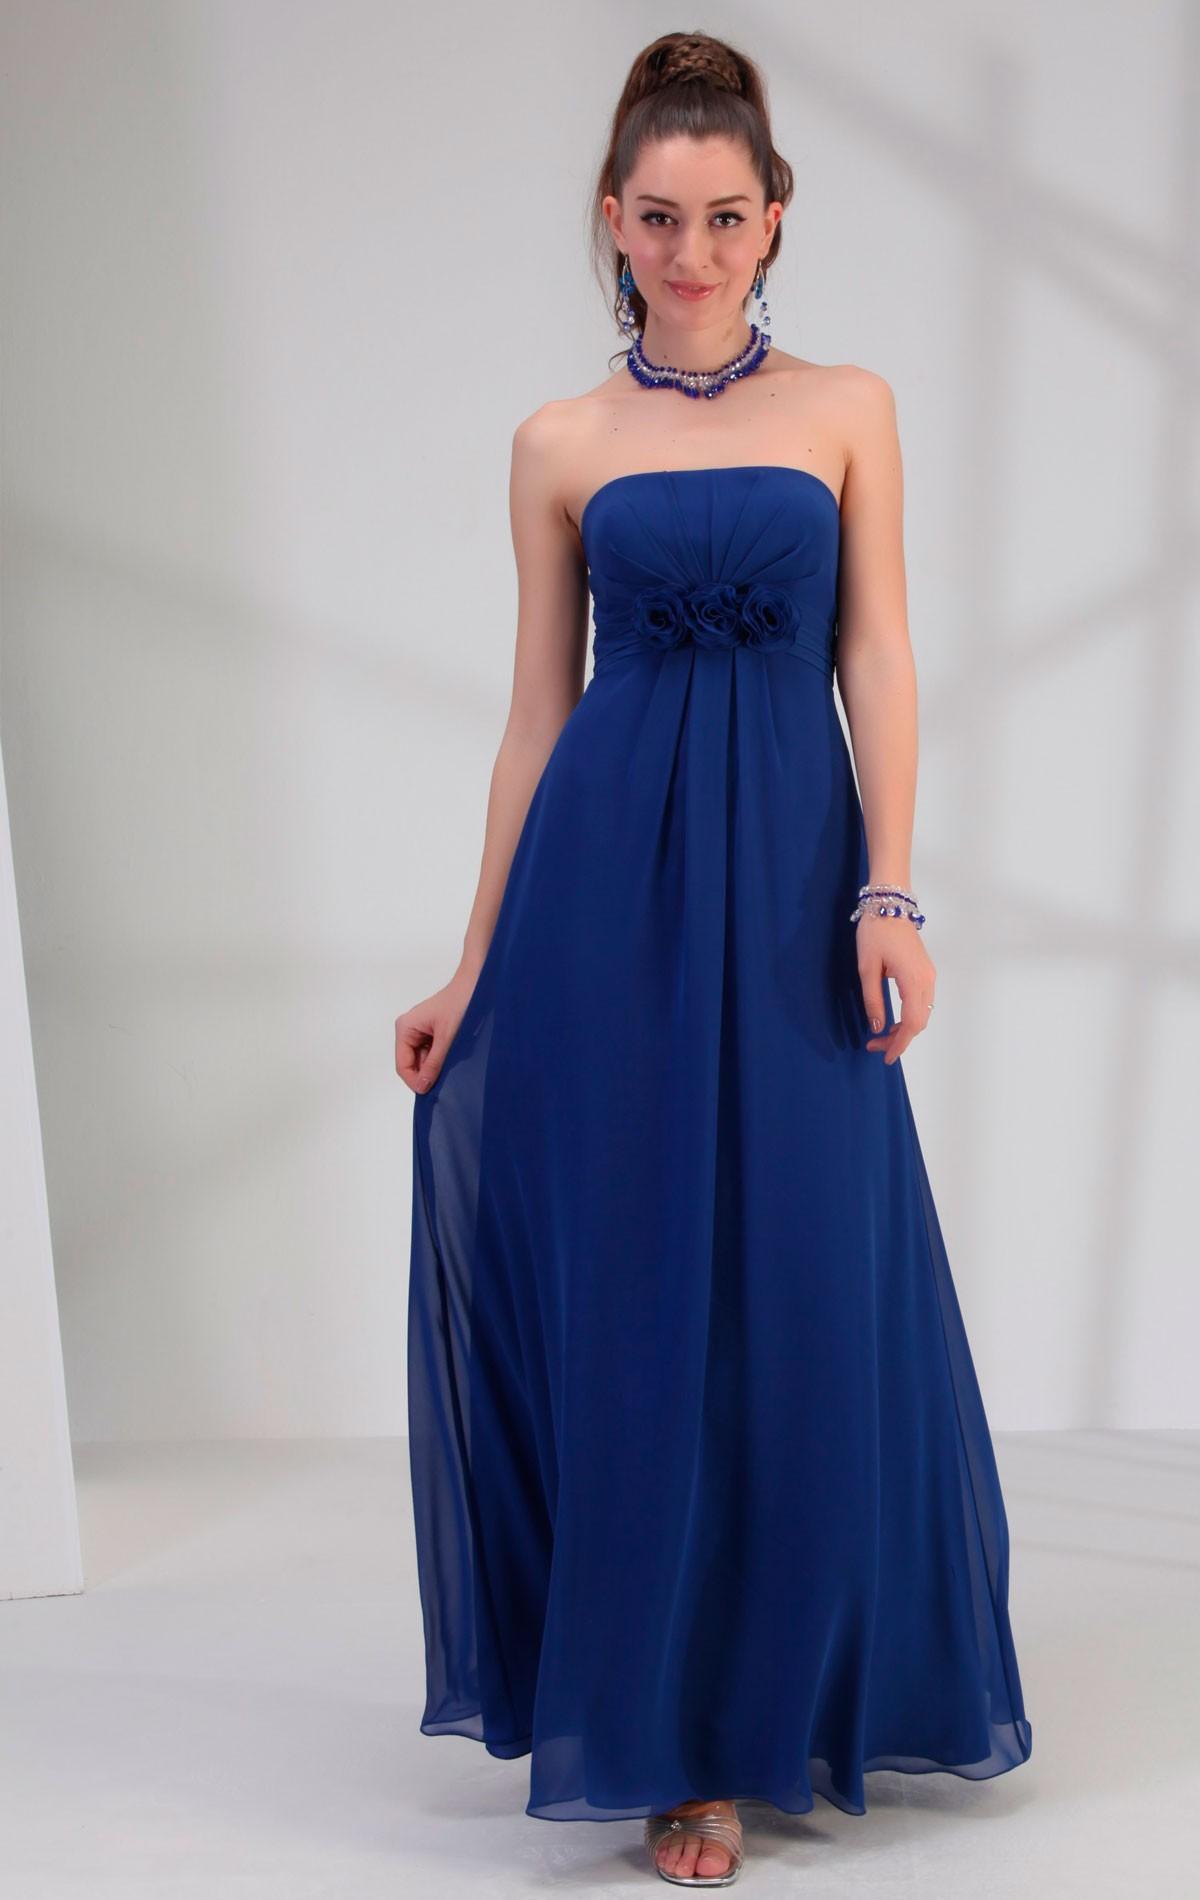 Venus bridesmaid dress bm1683 blessings of brighton bm1683 bridesmaid dress bm1683 full length royal blue chiffon dress with straight neckline and ombrellifo Image collections